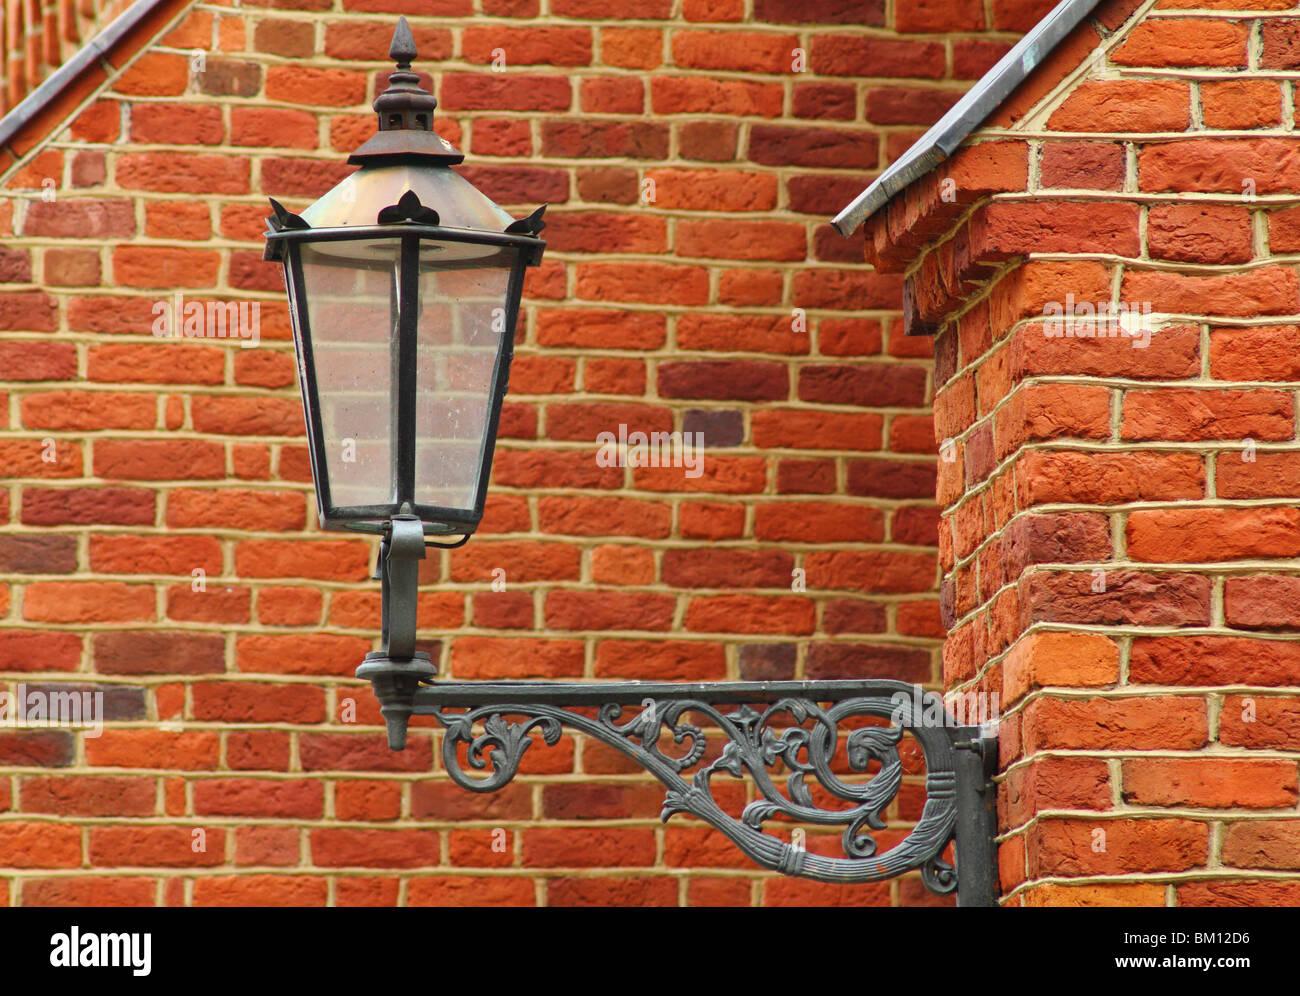 Old Gaslight Street Lamp Against Gothic Brick Wall Wroclaw Ostrow Tumski Poland